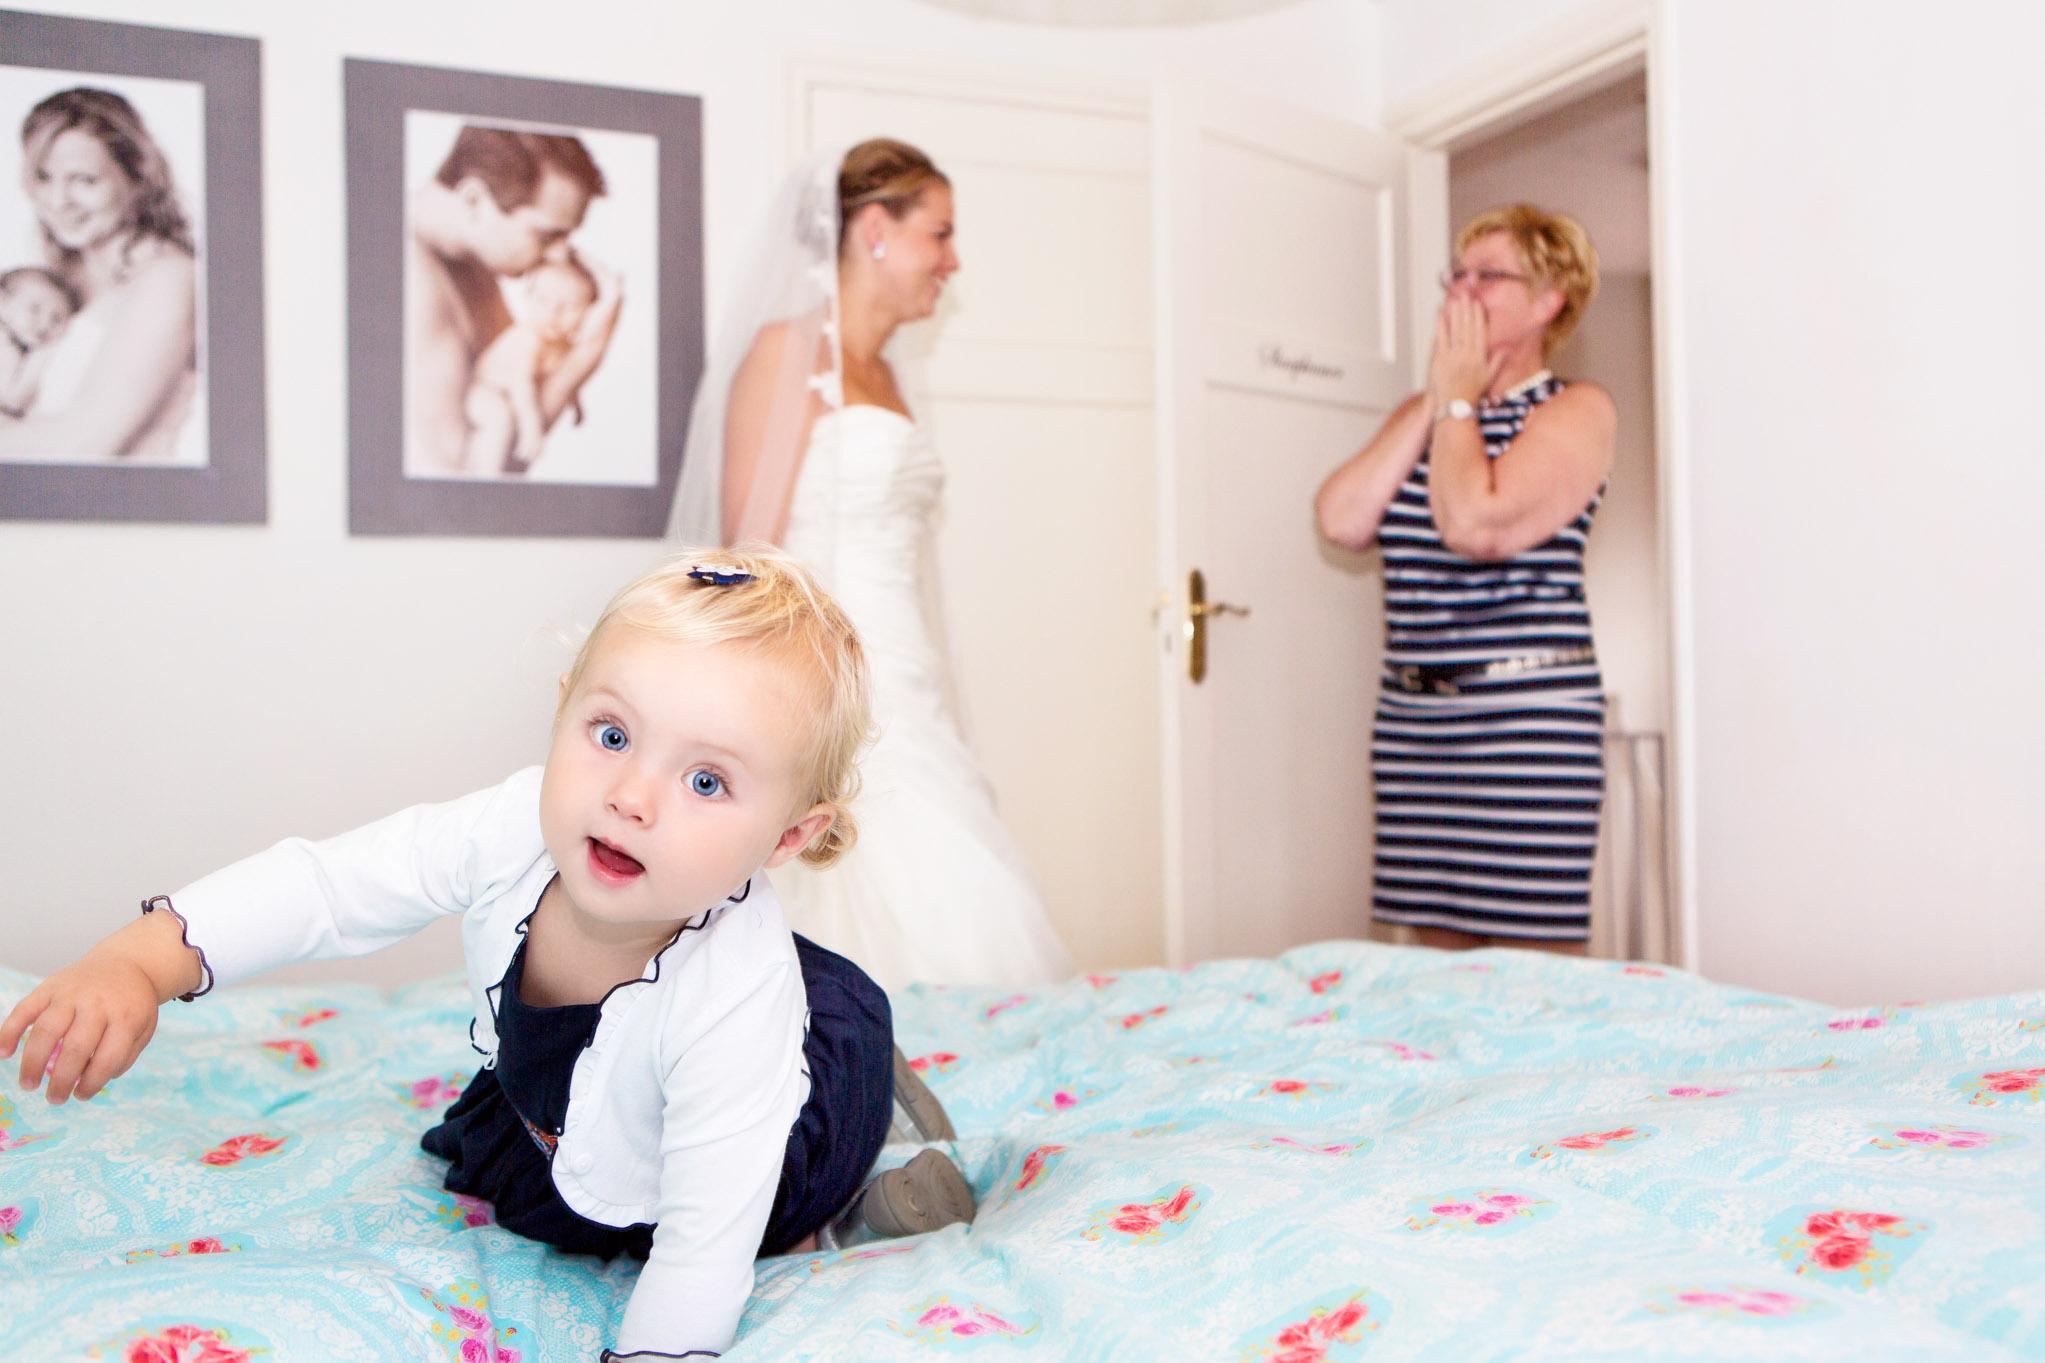 Bruiloft Oirschot,Moderne trouwfotografie, Slaapkamer bruid, Moeder dochter, Bruid, Bruidsmeisje